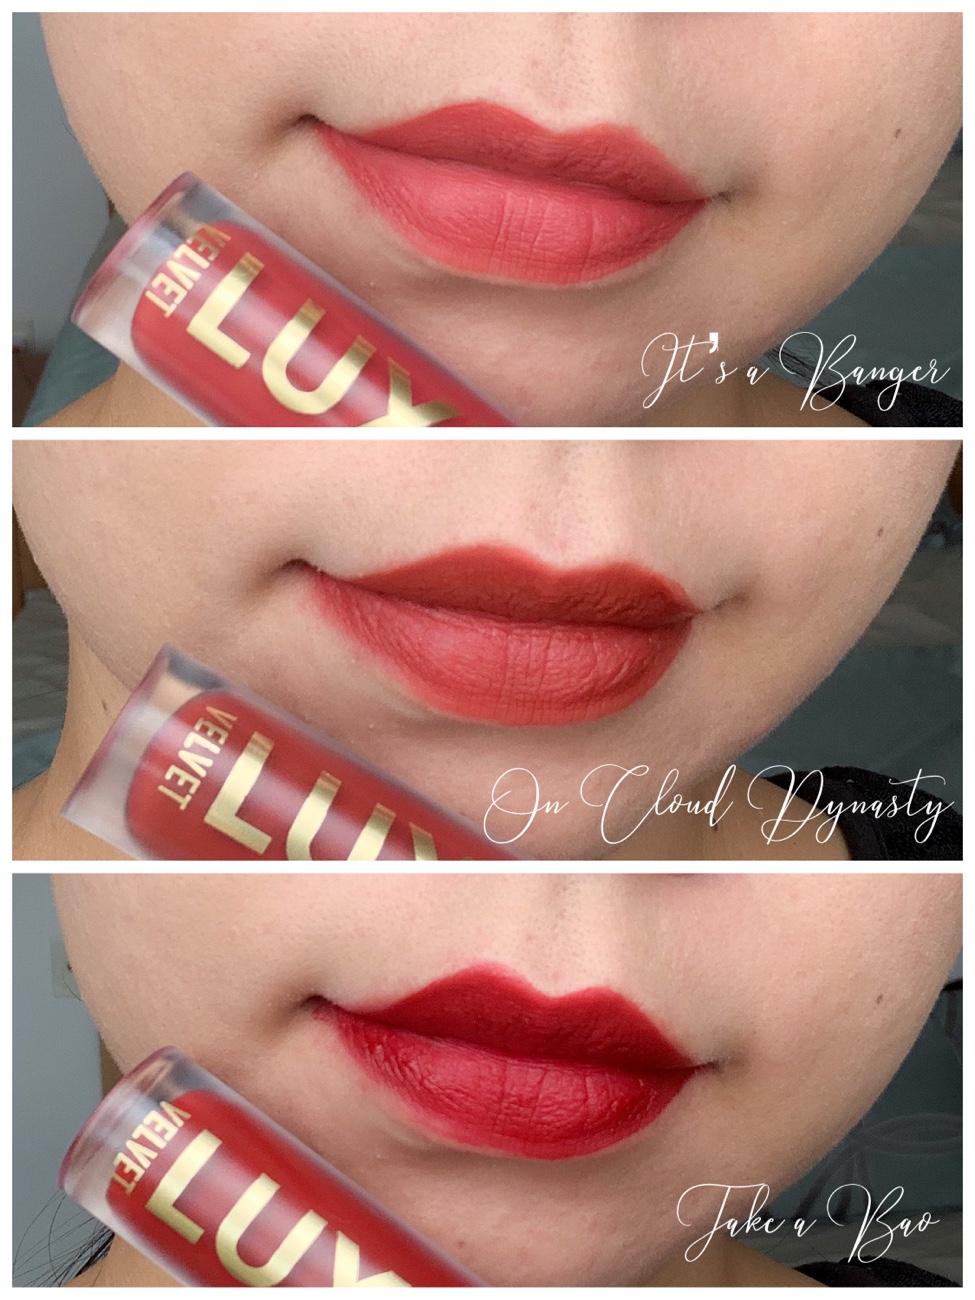 Colourpop Lux Liquid Lip : colourpop, liquid, ColourPop, Lunar, Collection, Bellyrubz, Beauty